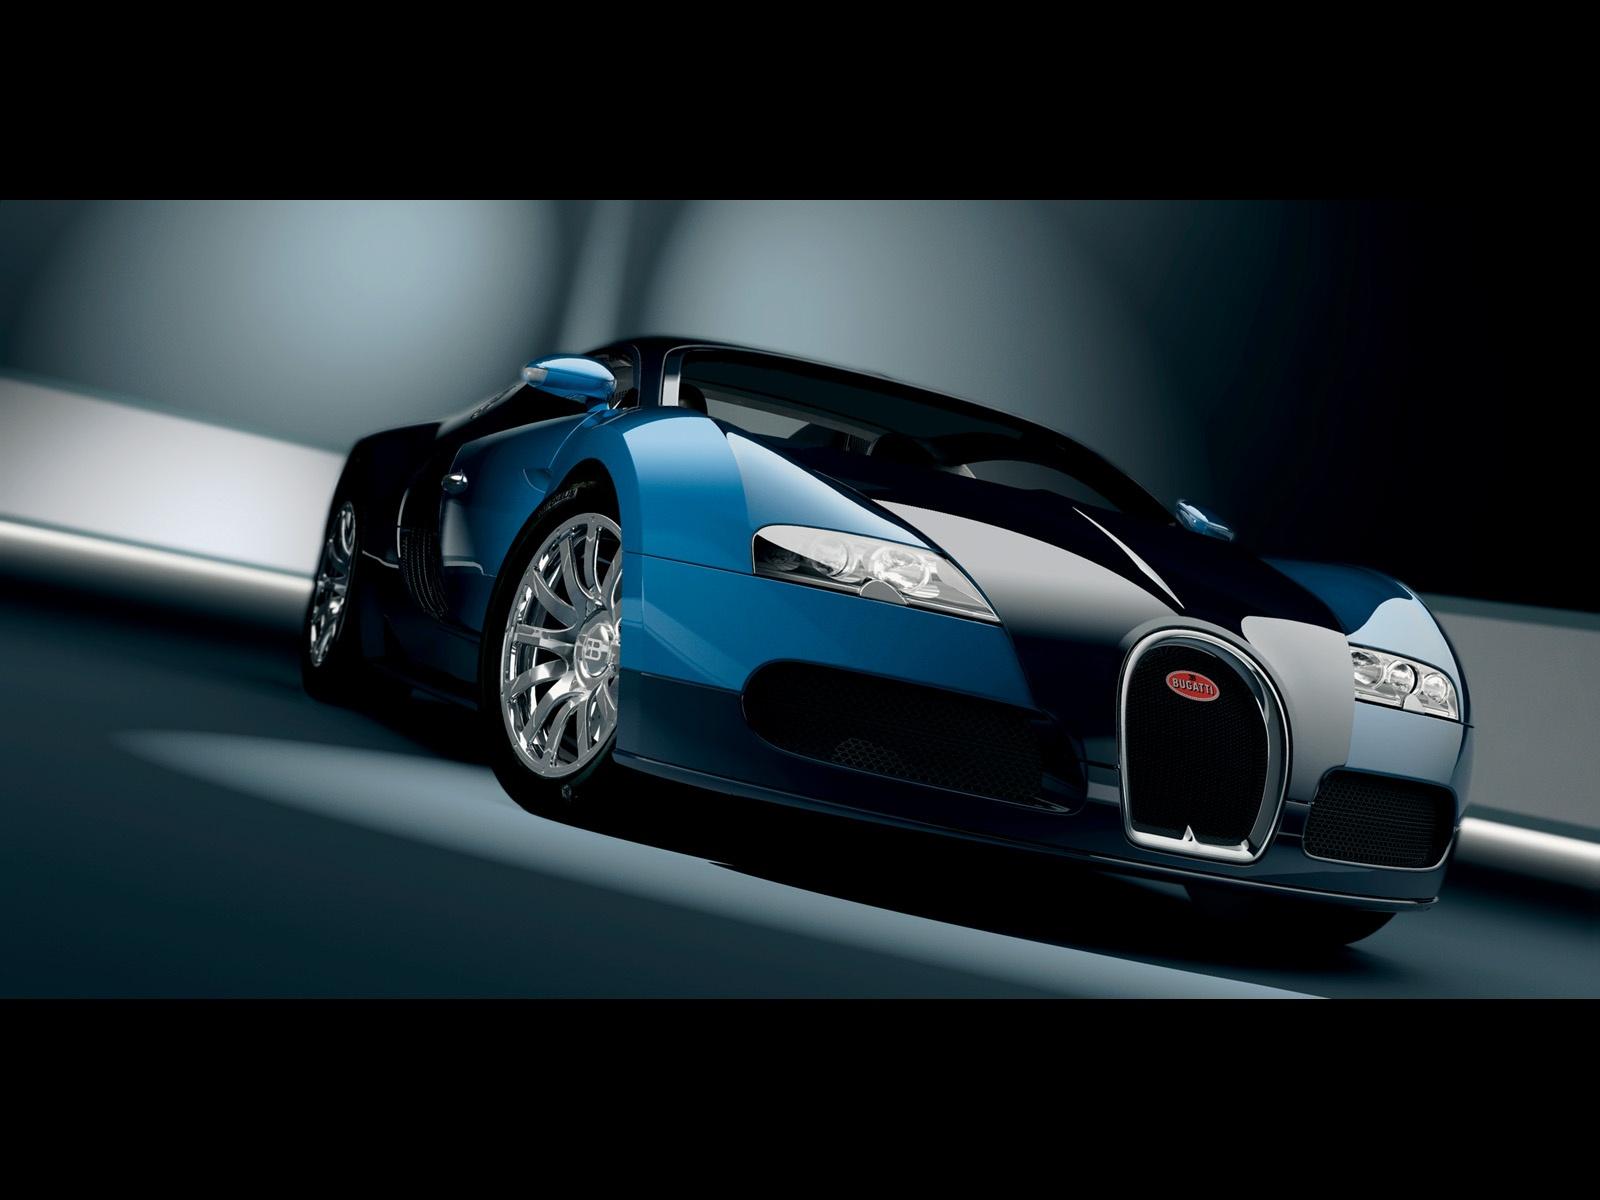 bugatti veyron cool car desktop pictures